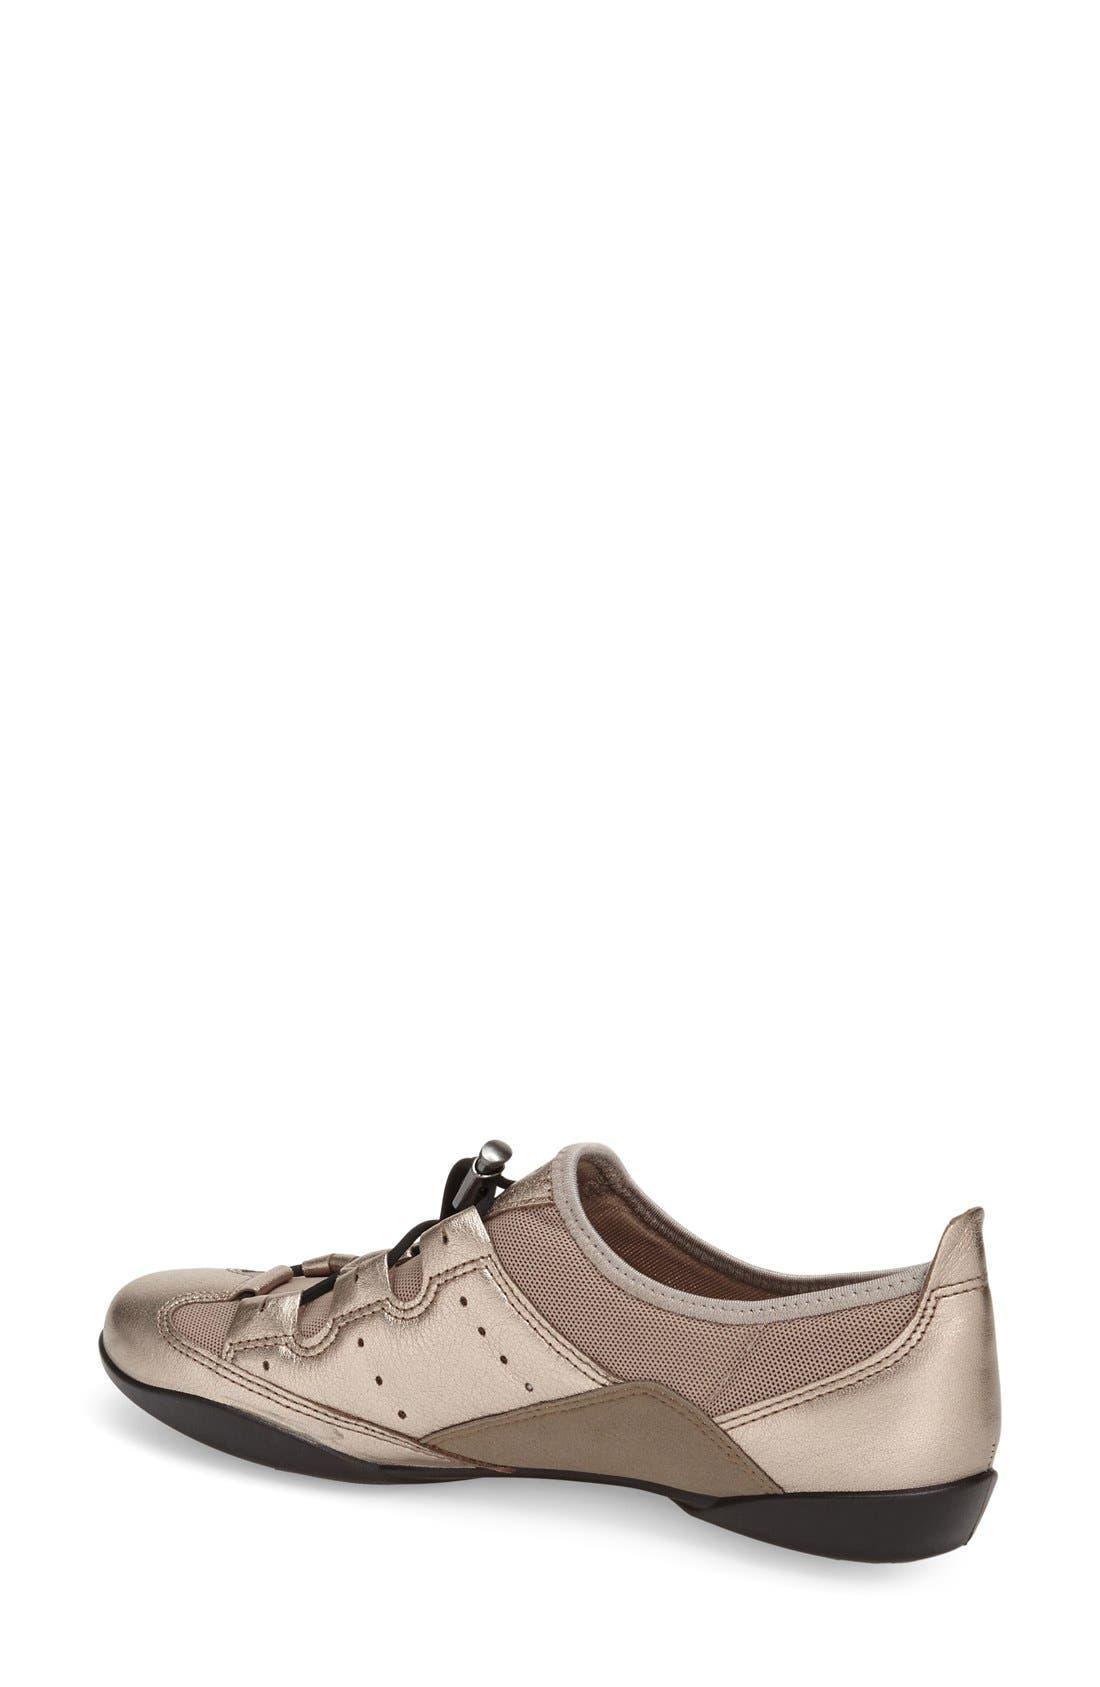 'Bluma' Sneaker,                             Alternate thumbnail 2, color,                             097